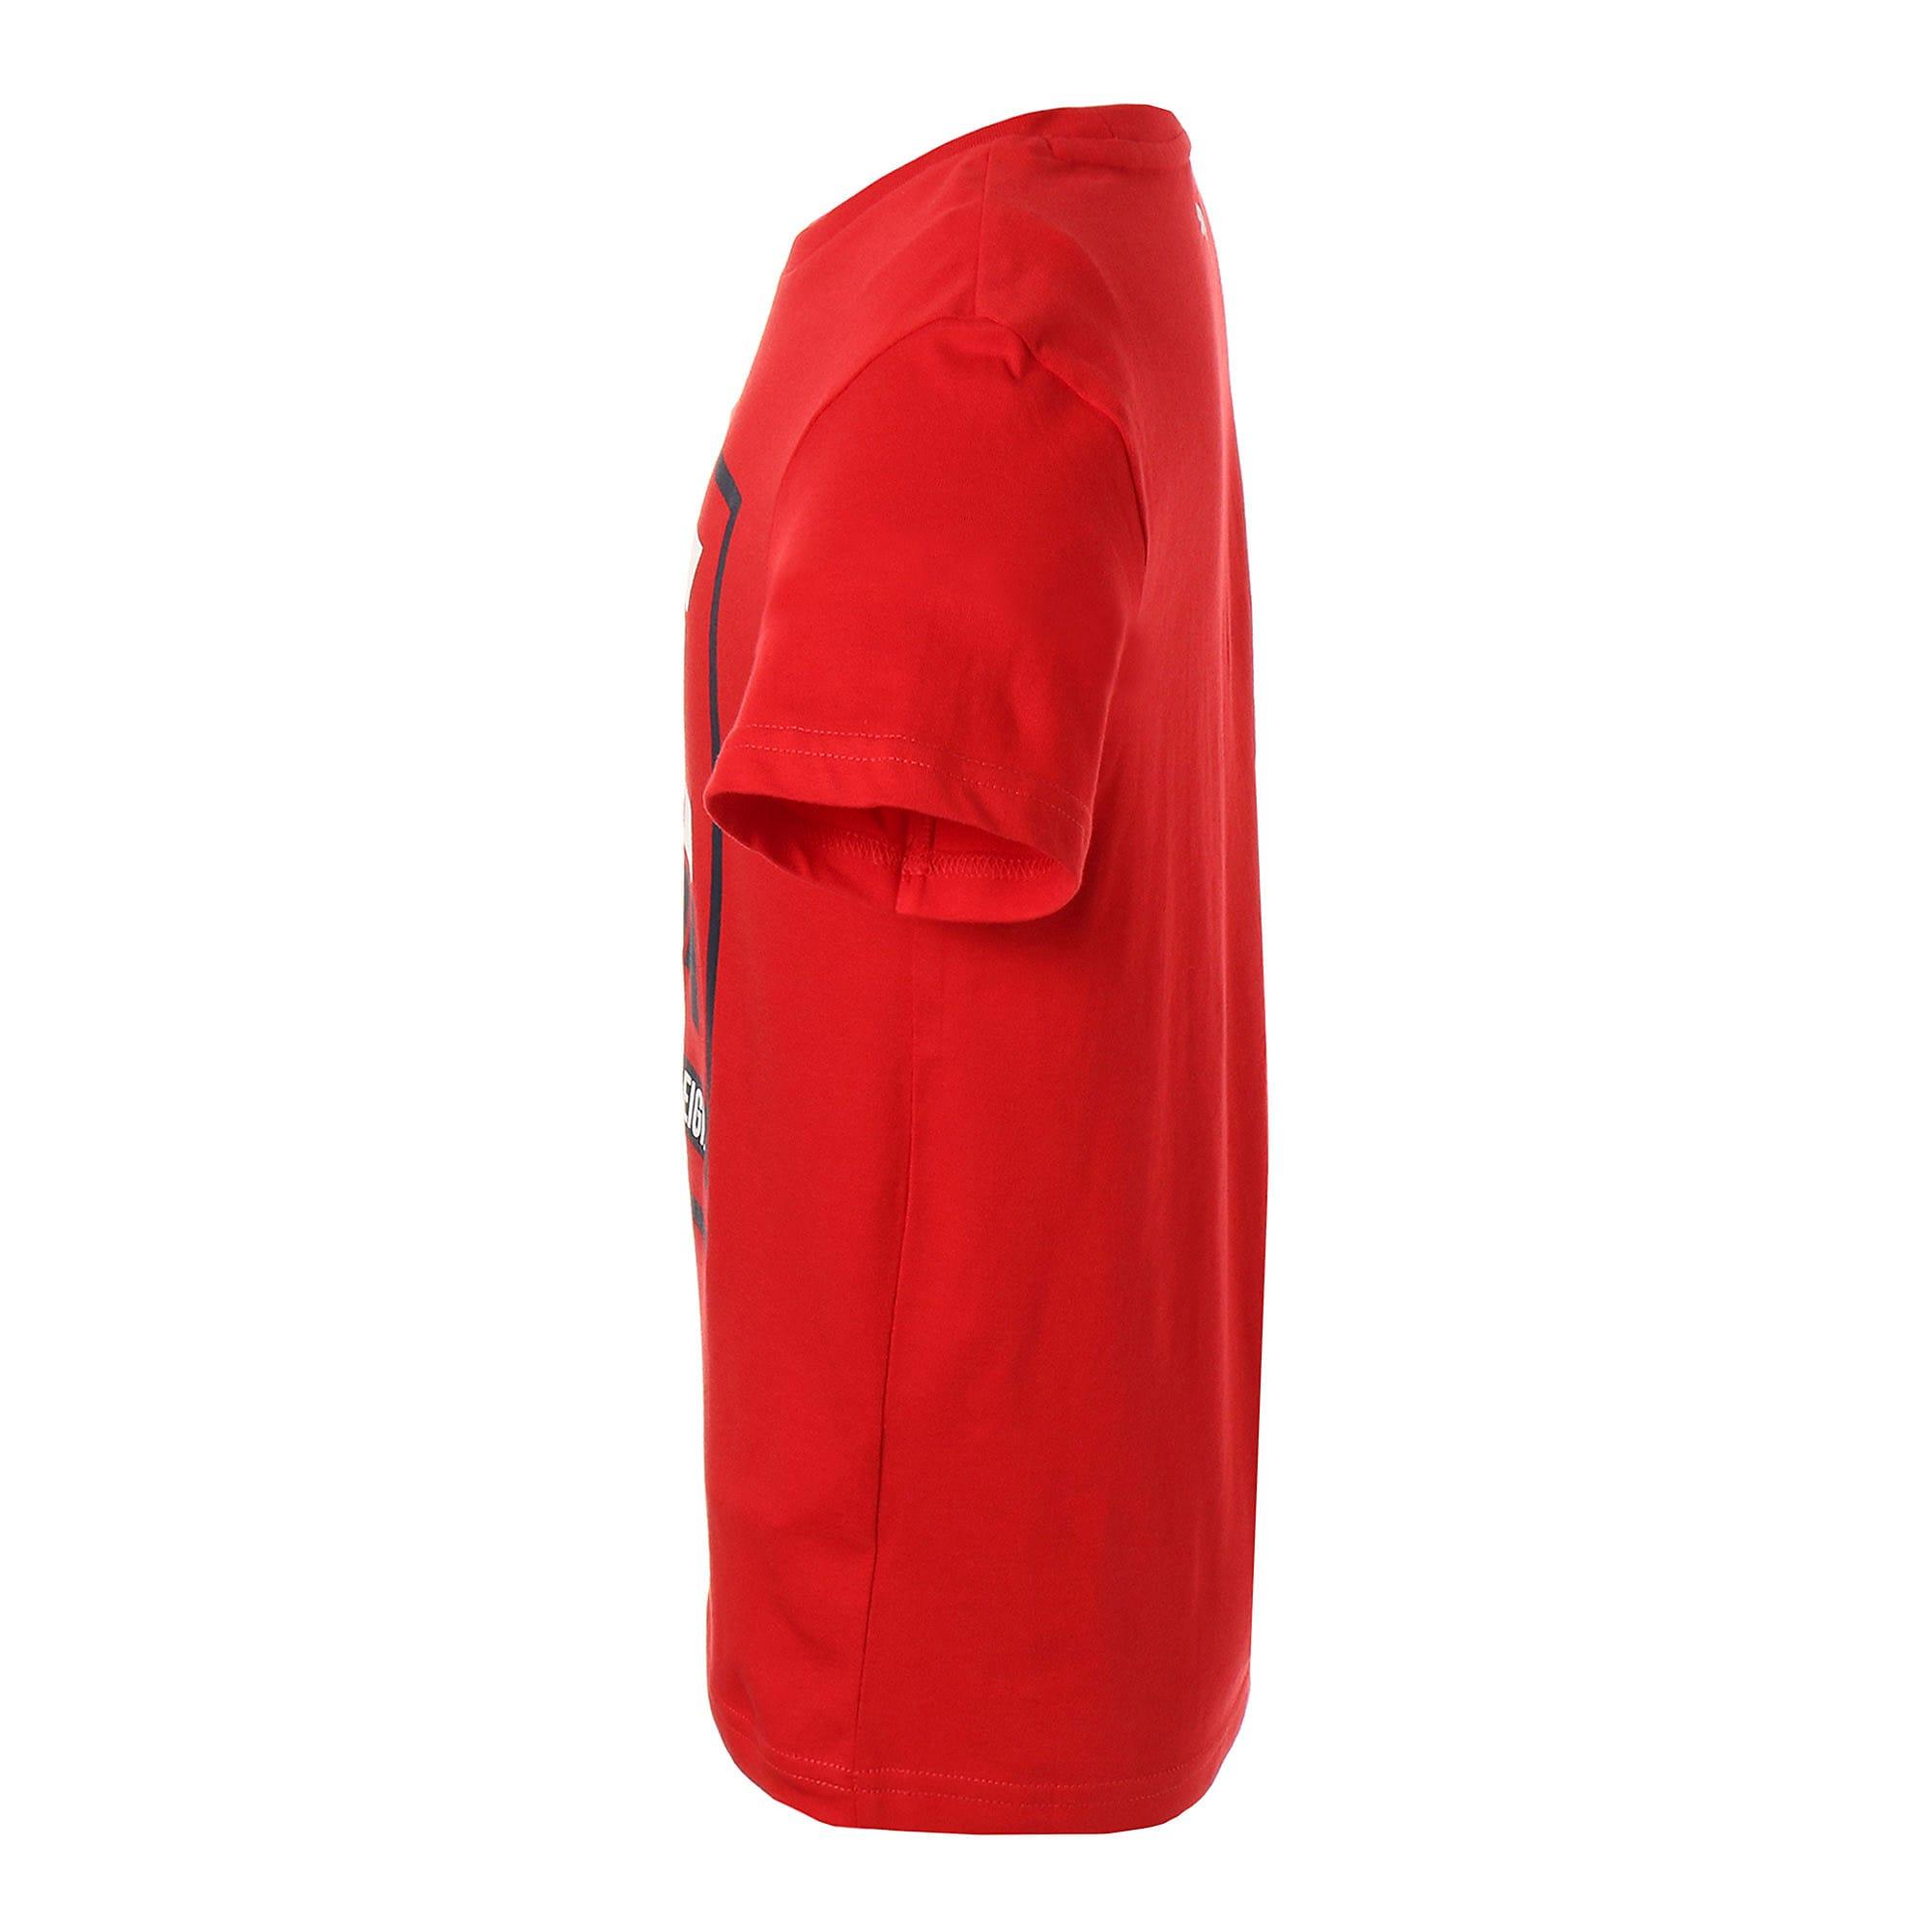 Thumbnail 3 of キッズ ALPHA SS グラフィック Tシャツ 半袖, High Risk Red, medium-JPN